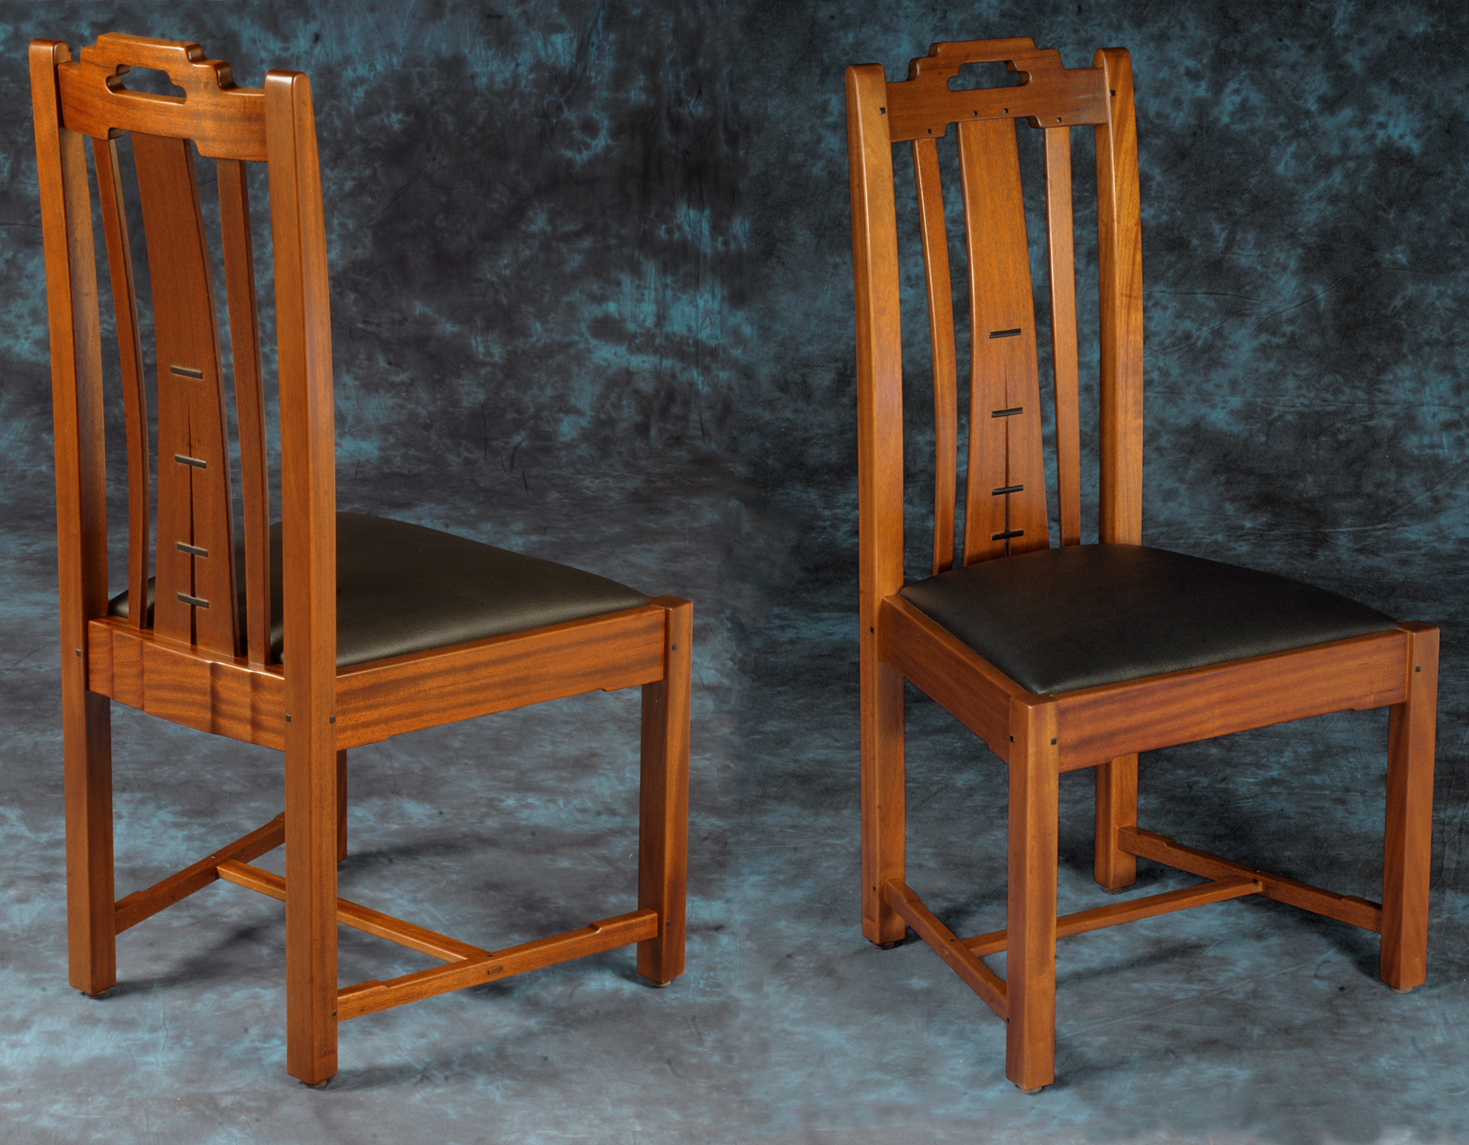 Furniture Gallery Darrell Peart Furnituremaker